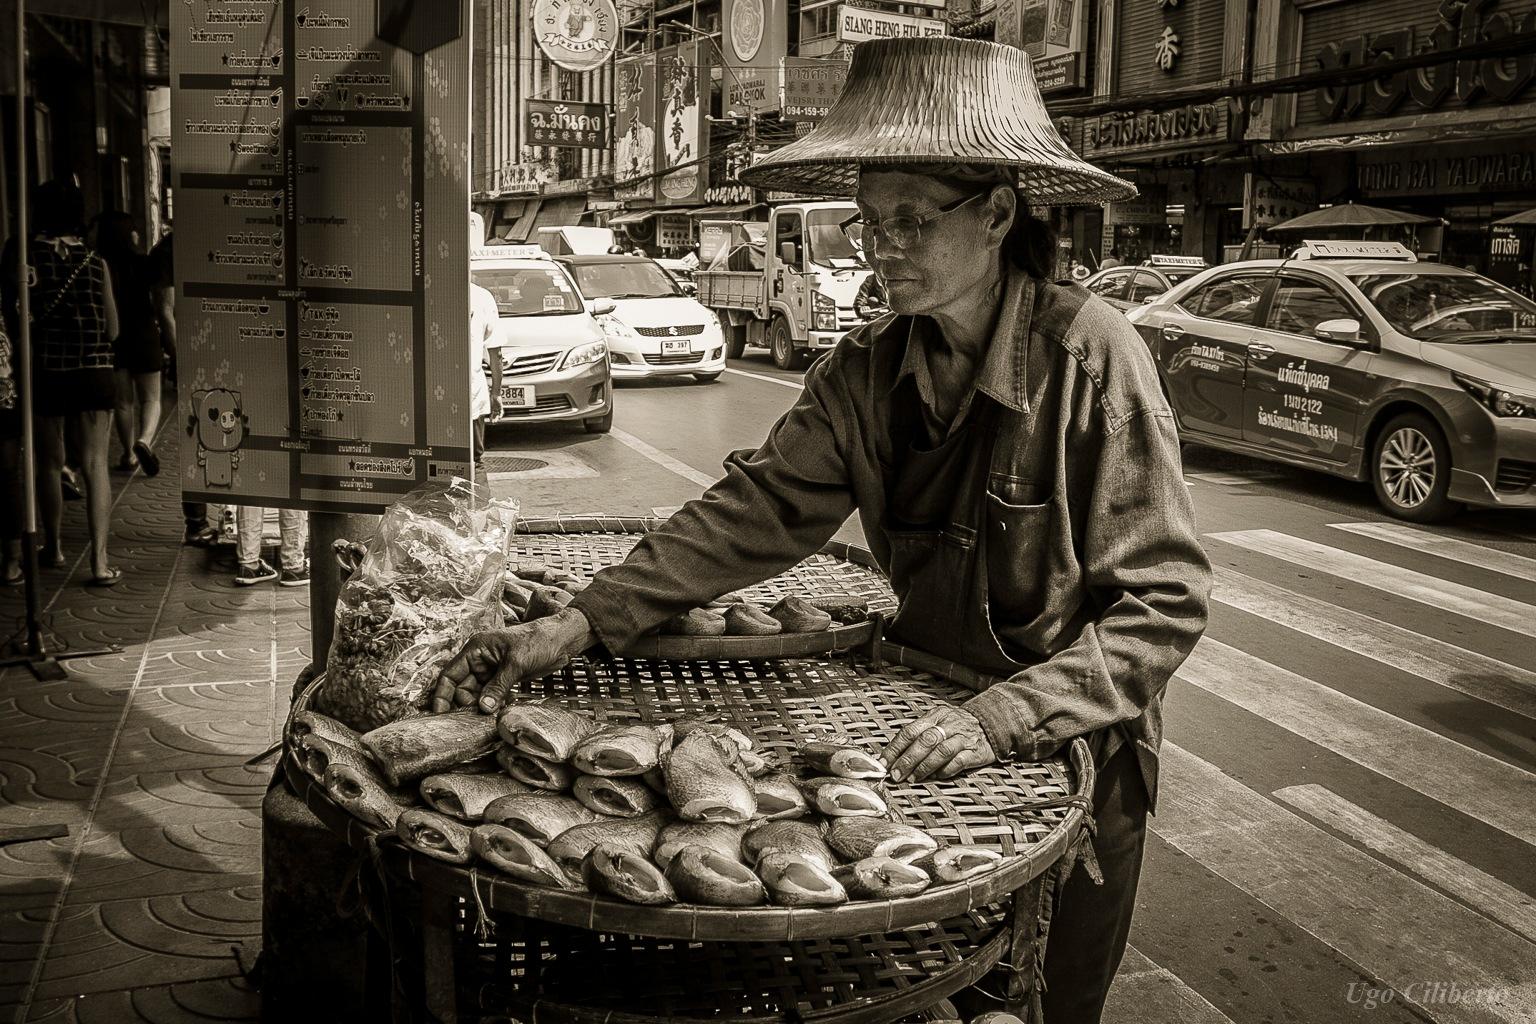 Bangkok - Chinatown - Venditrice di pesce by ugo